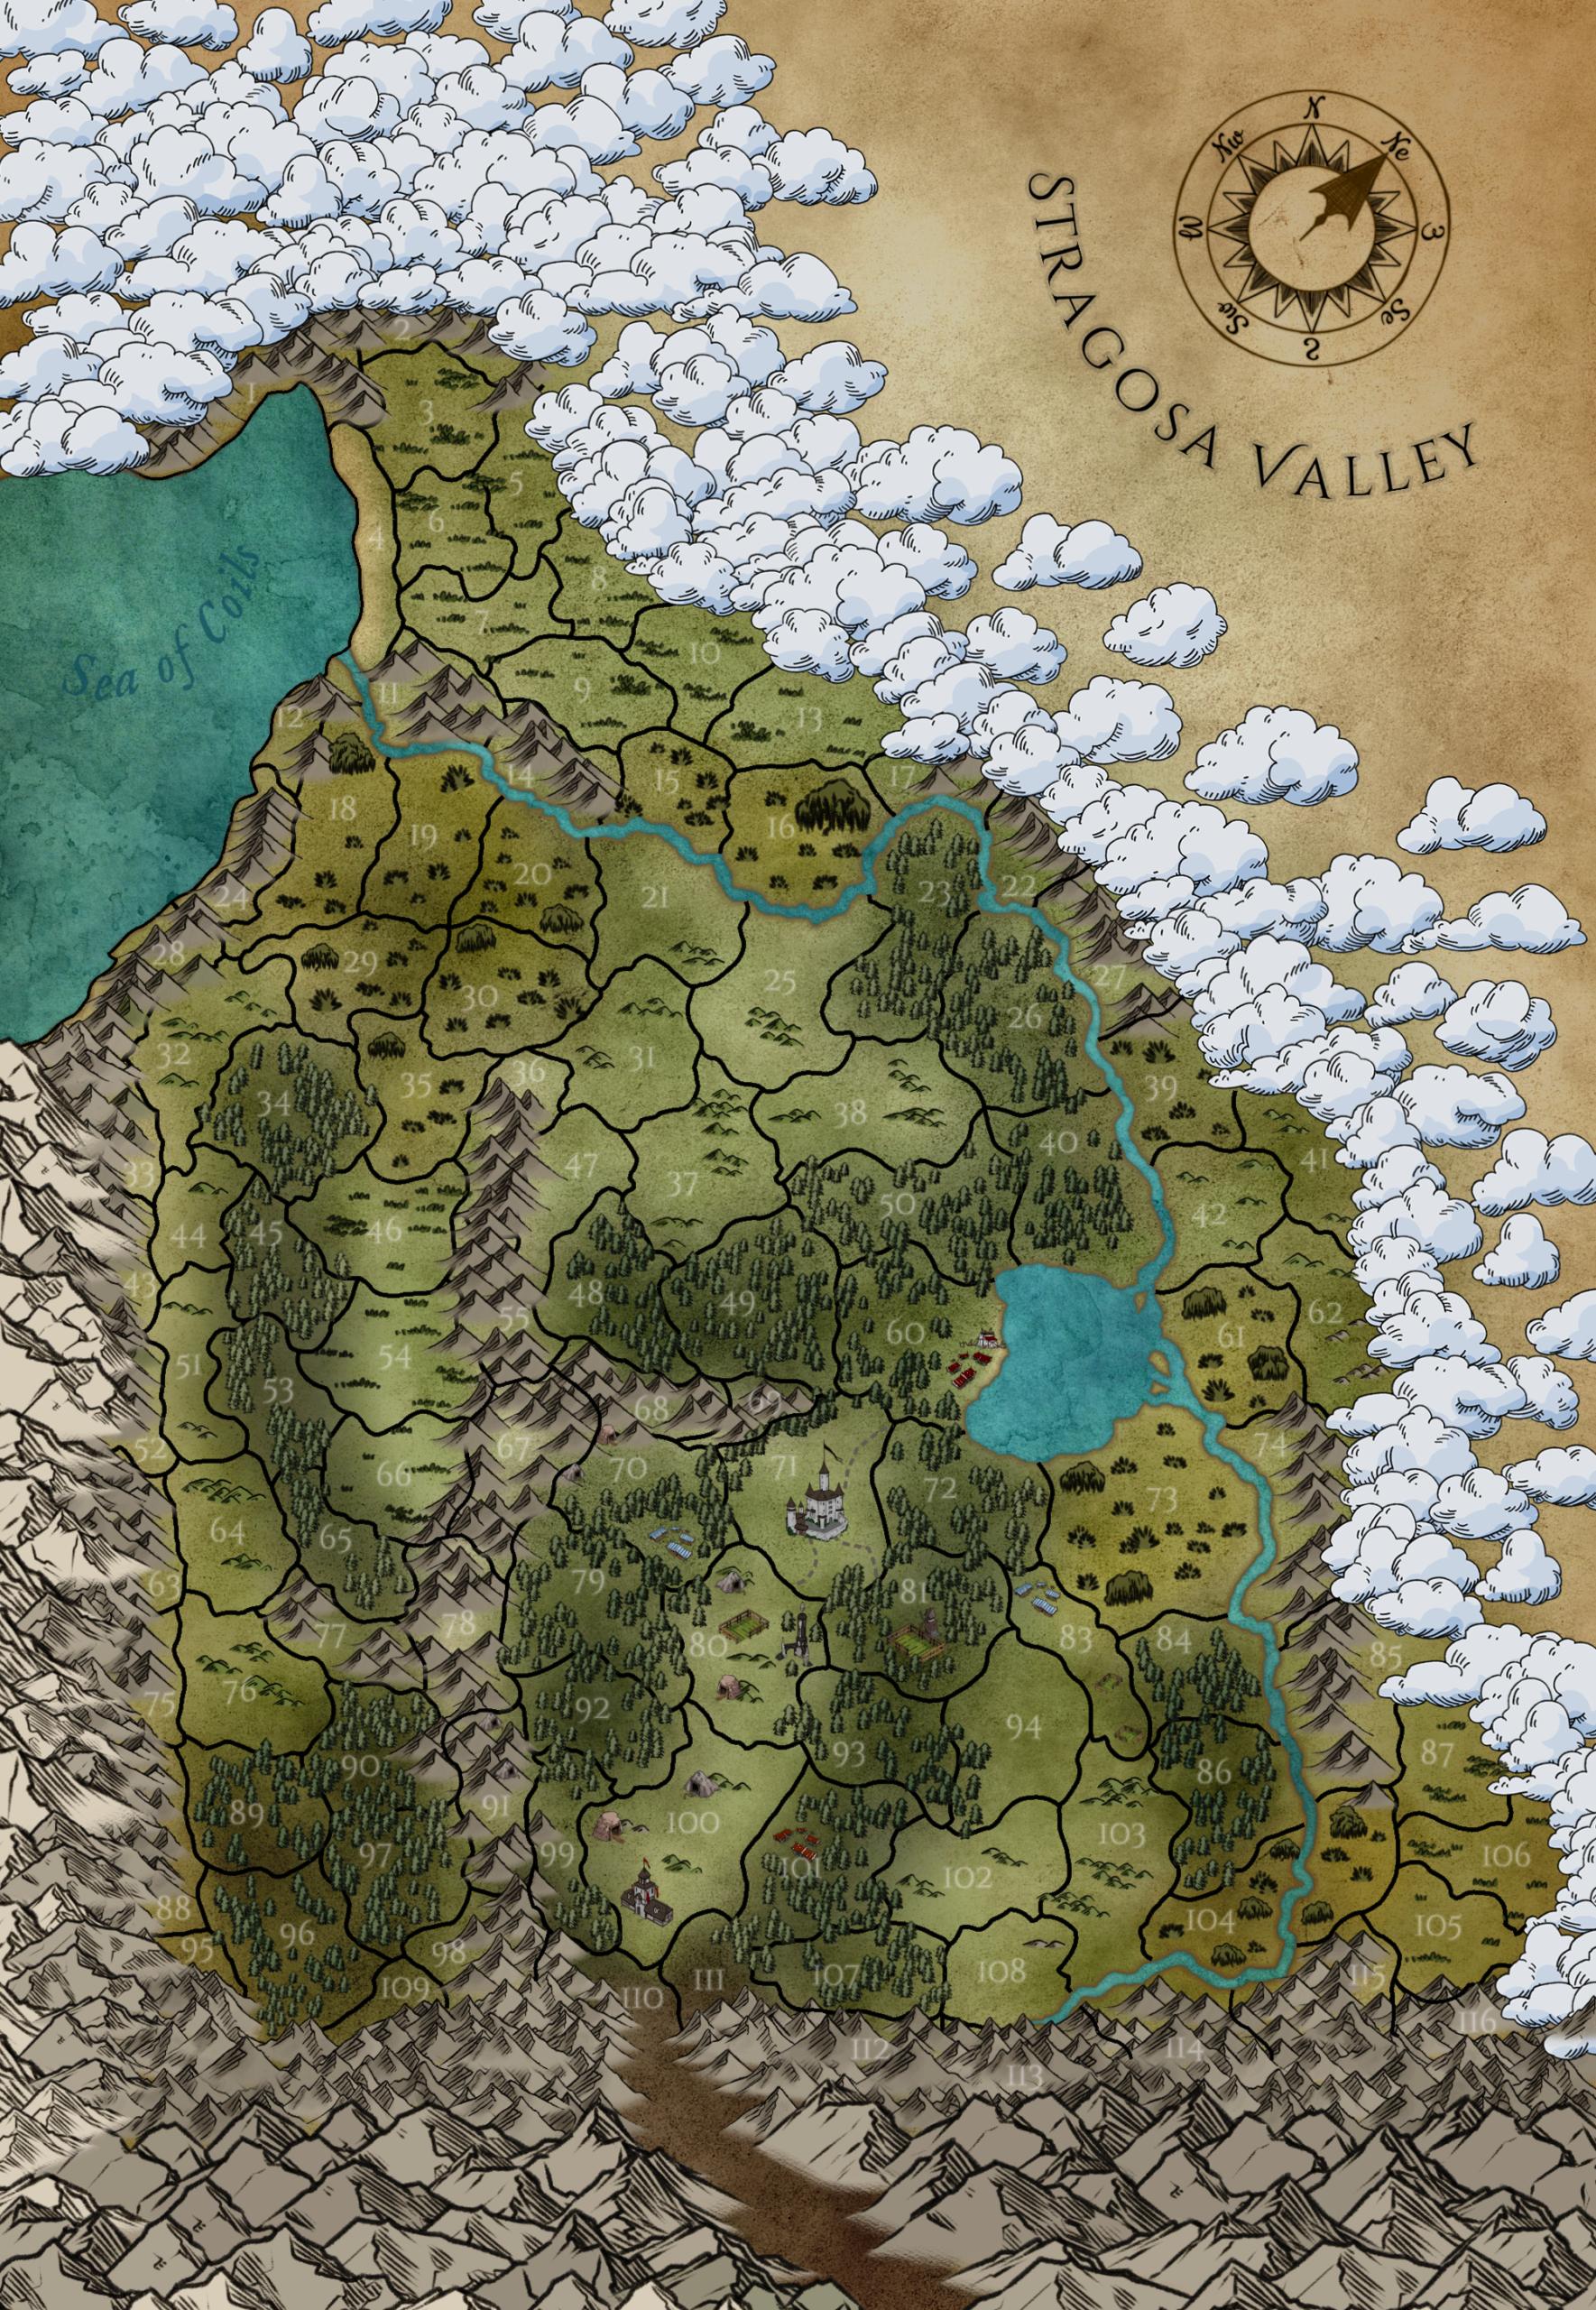 Stragosa Valley